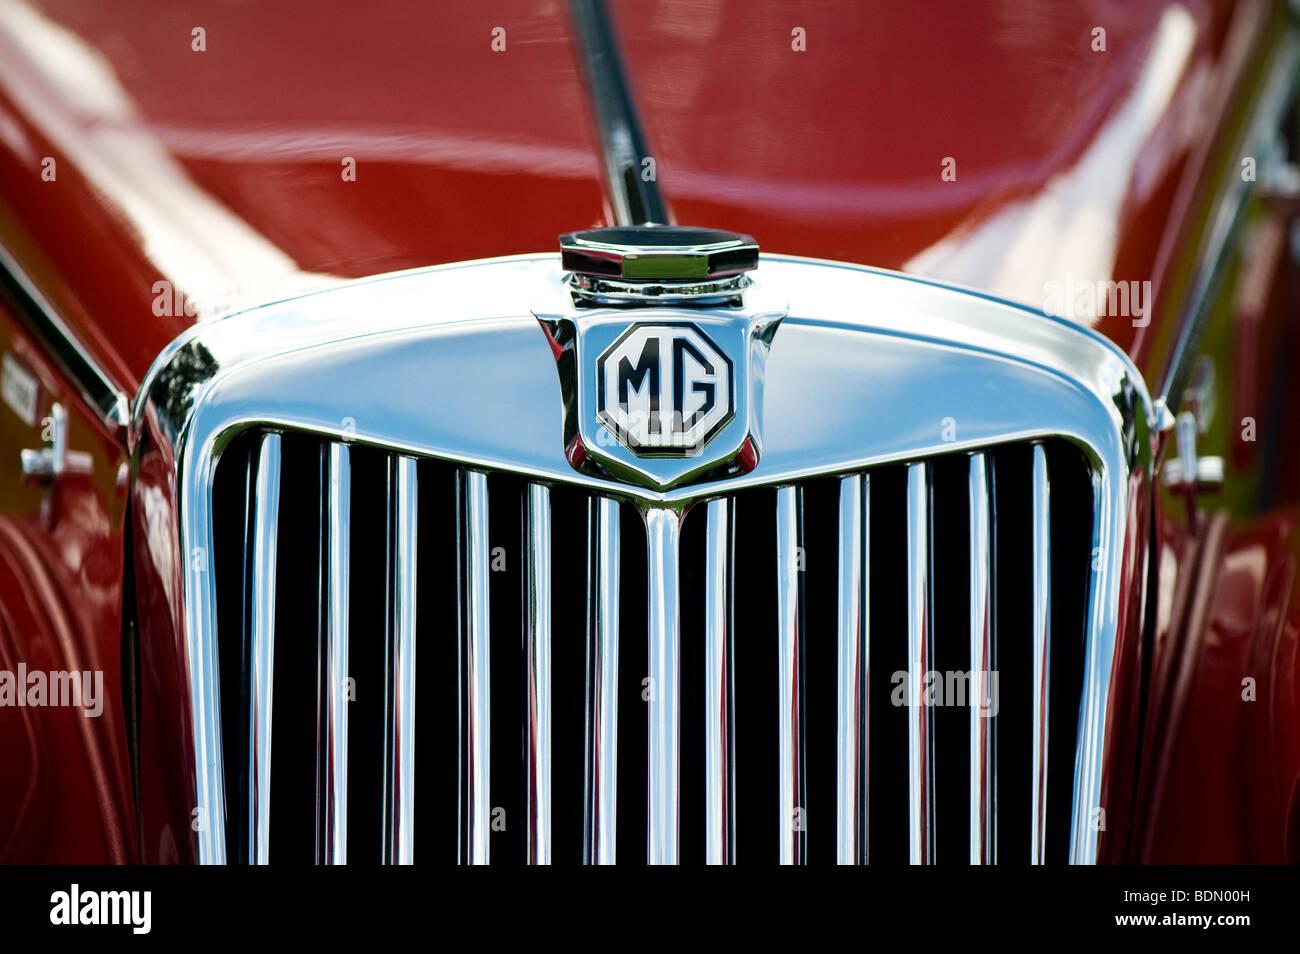 Mg tf 1500 classic british car stock photo royalty free image mg tf 1500 classic british car vanachro Images